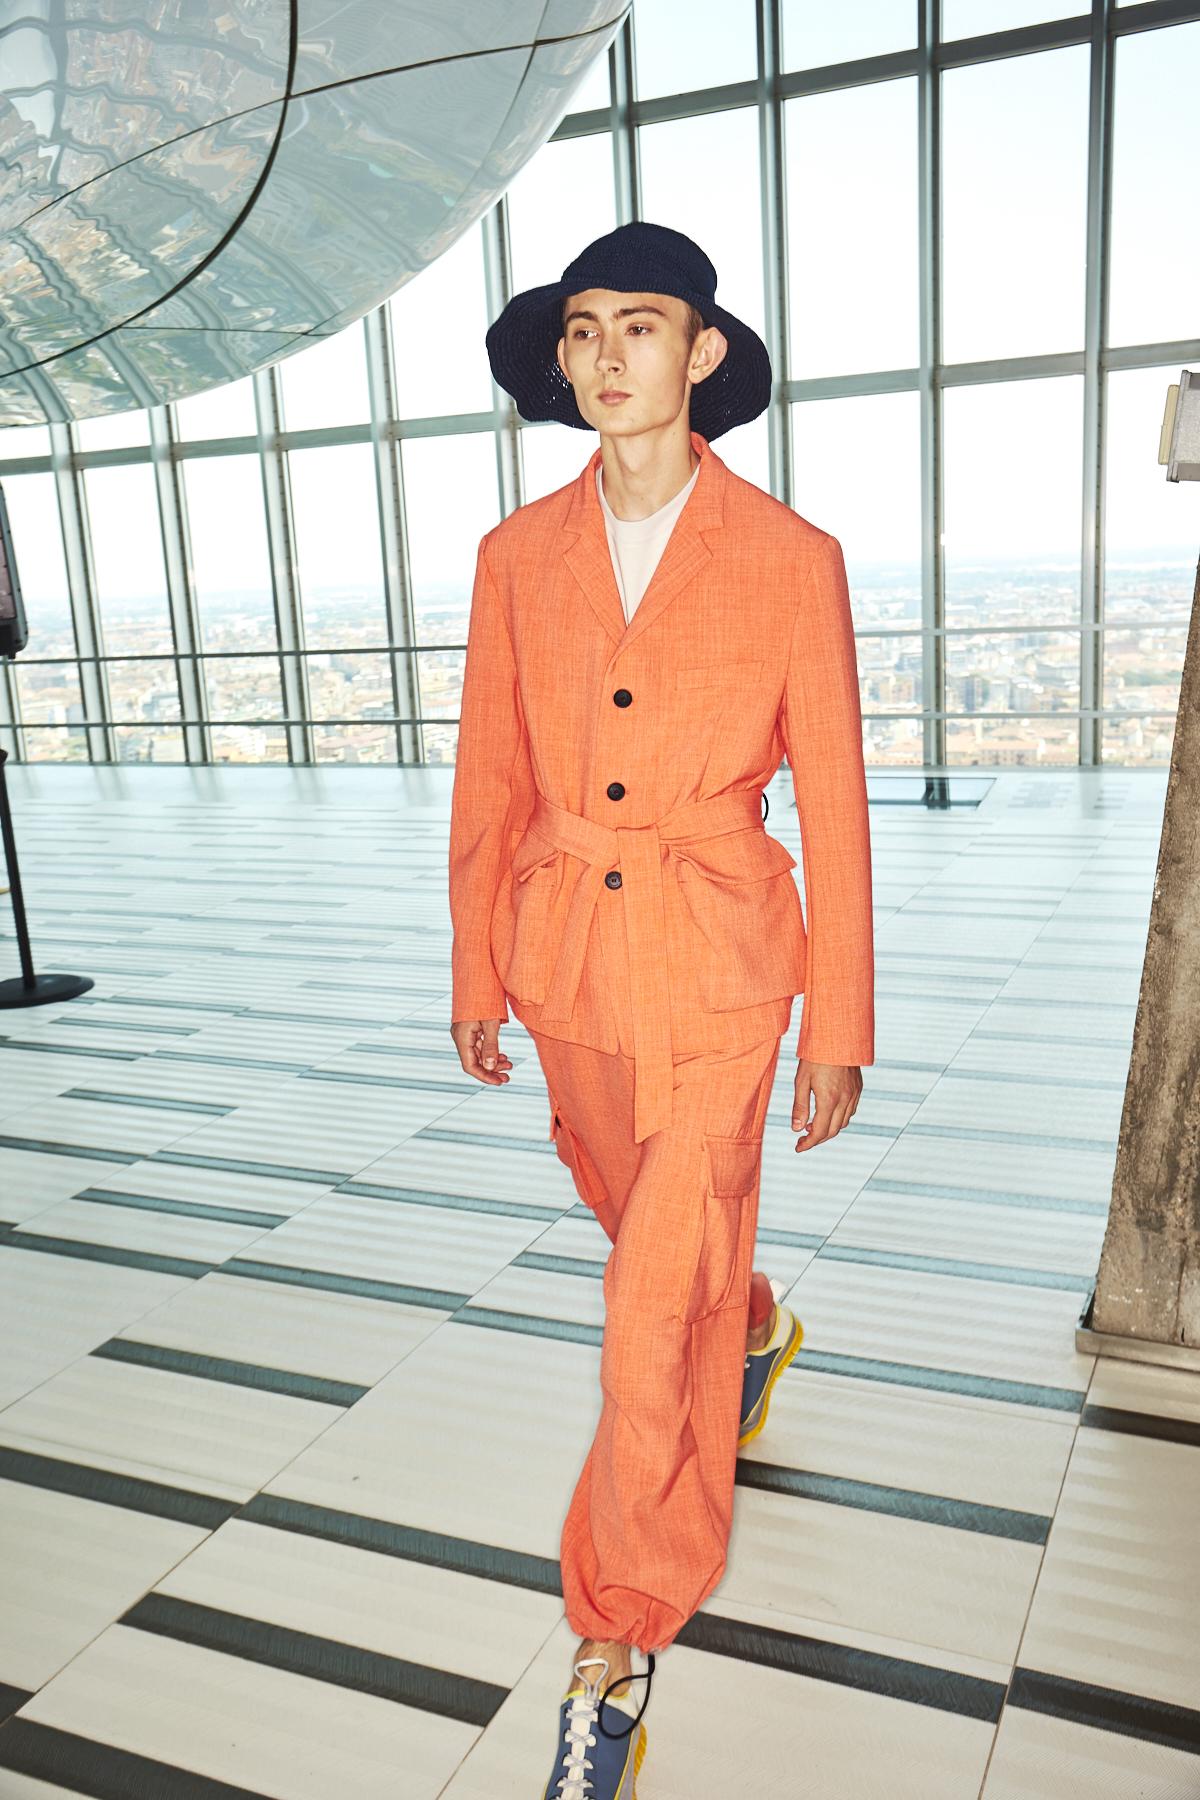 Sunnei Men/Woman Fashion Show Milan Backstage